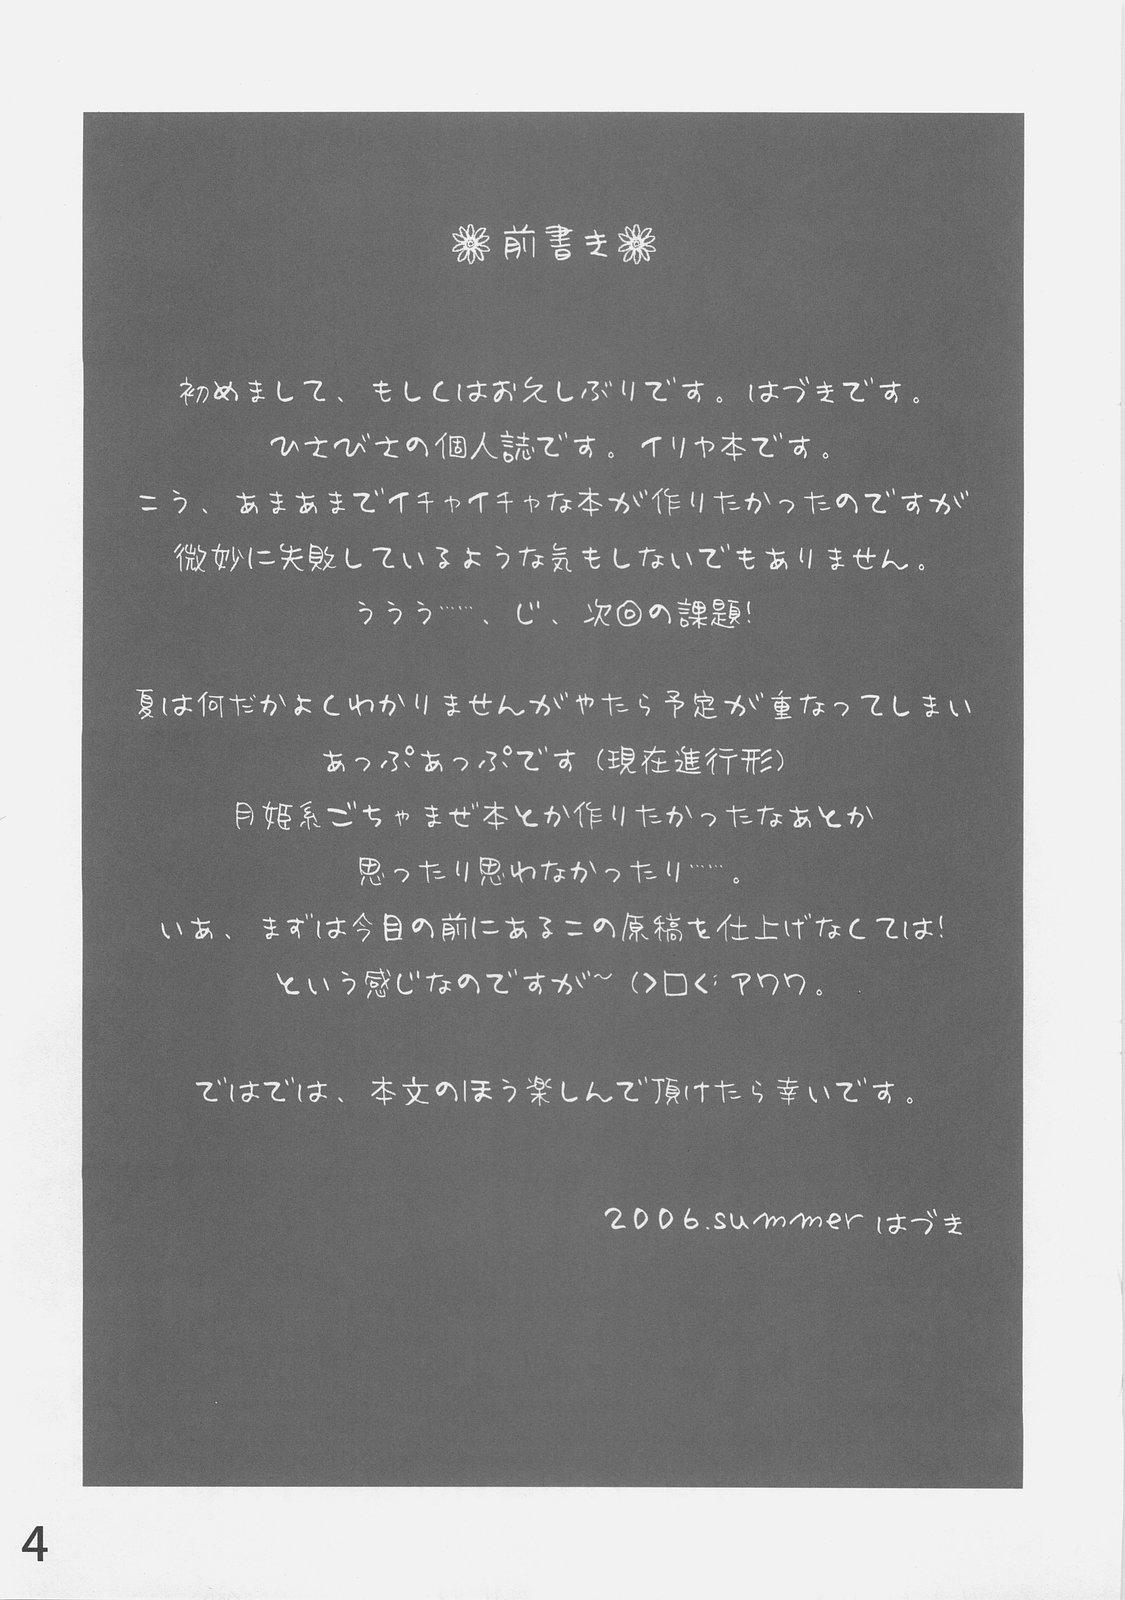 Shiroi Koibito 2